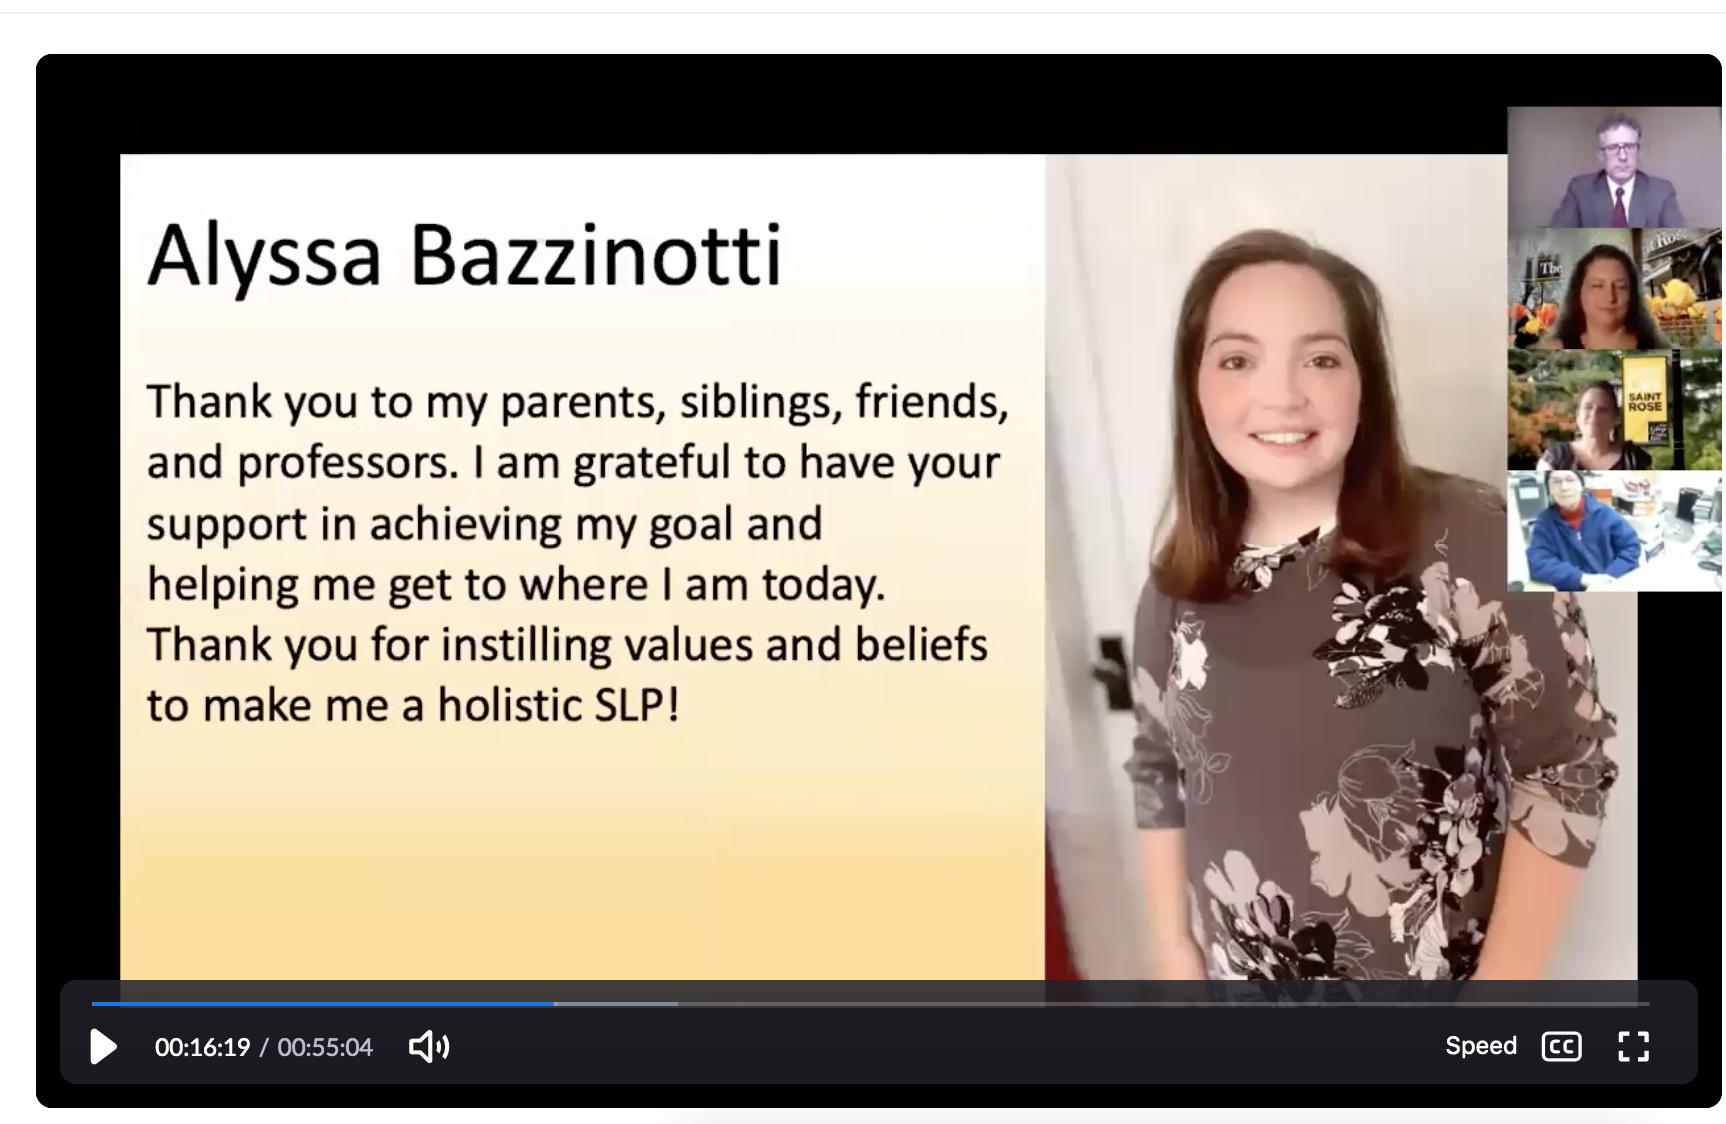 Alyssa Bazzinotti's slide from the virtual CSD graduation